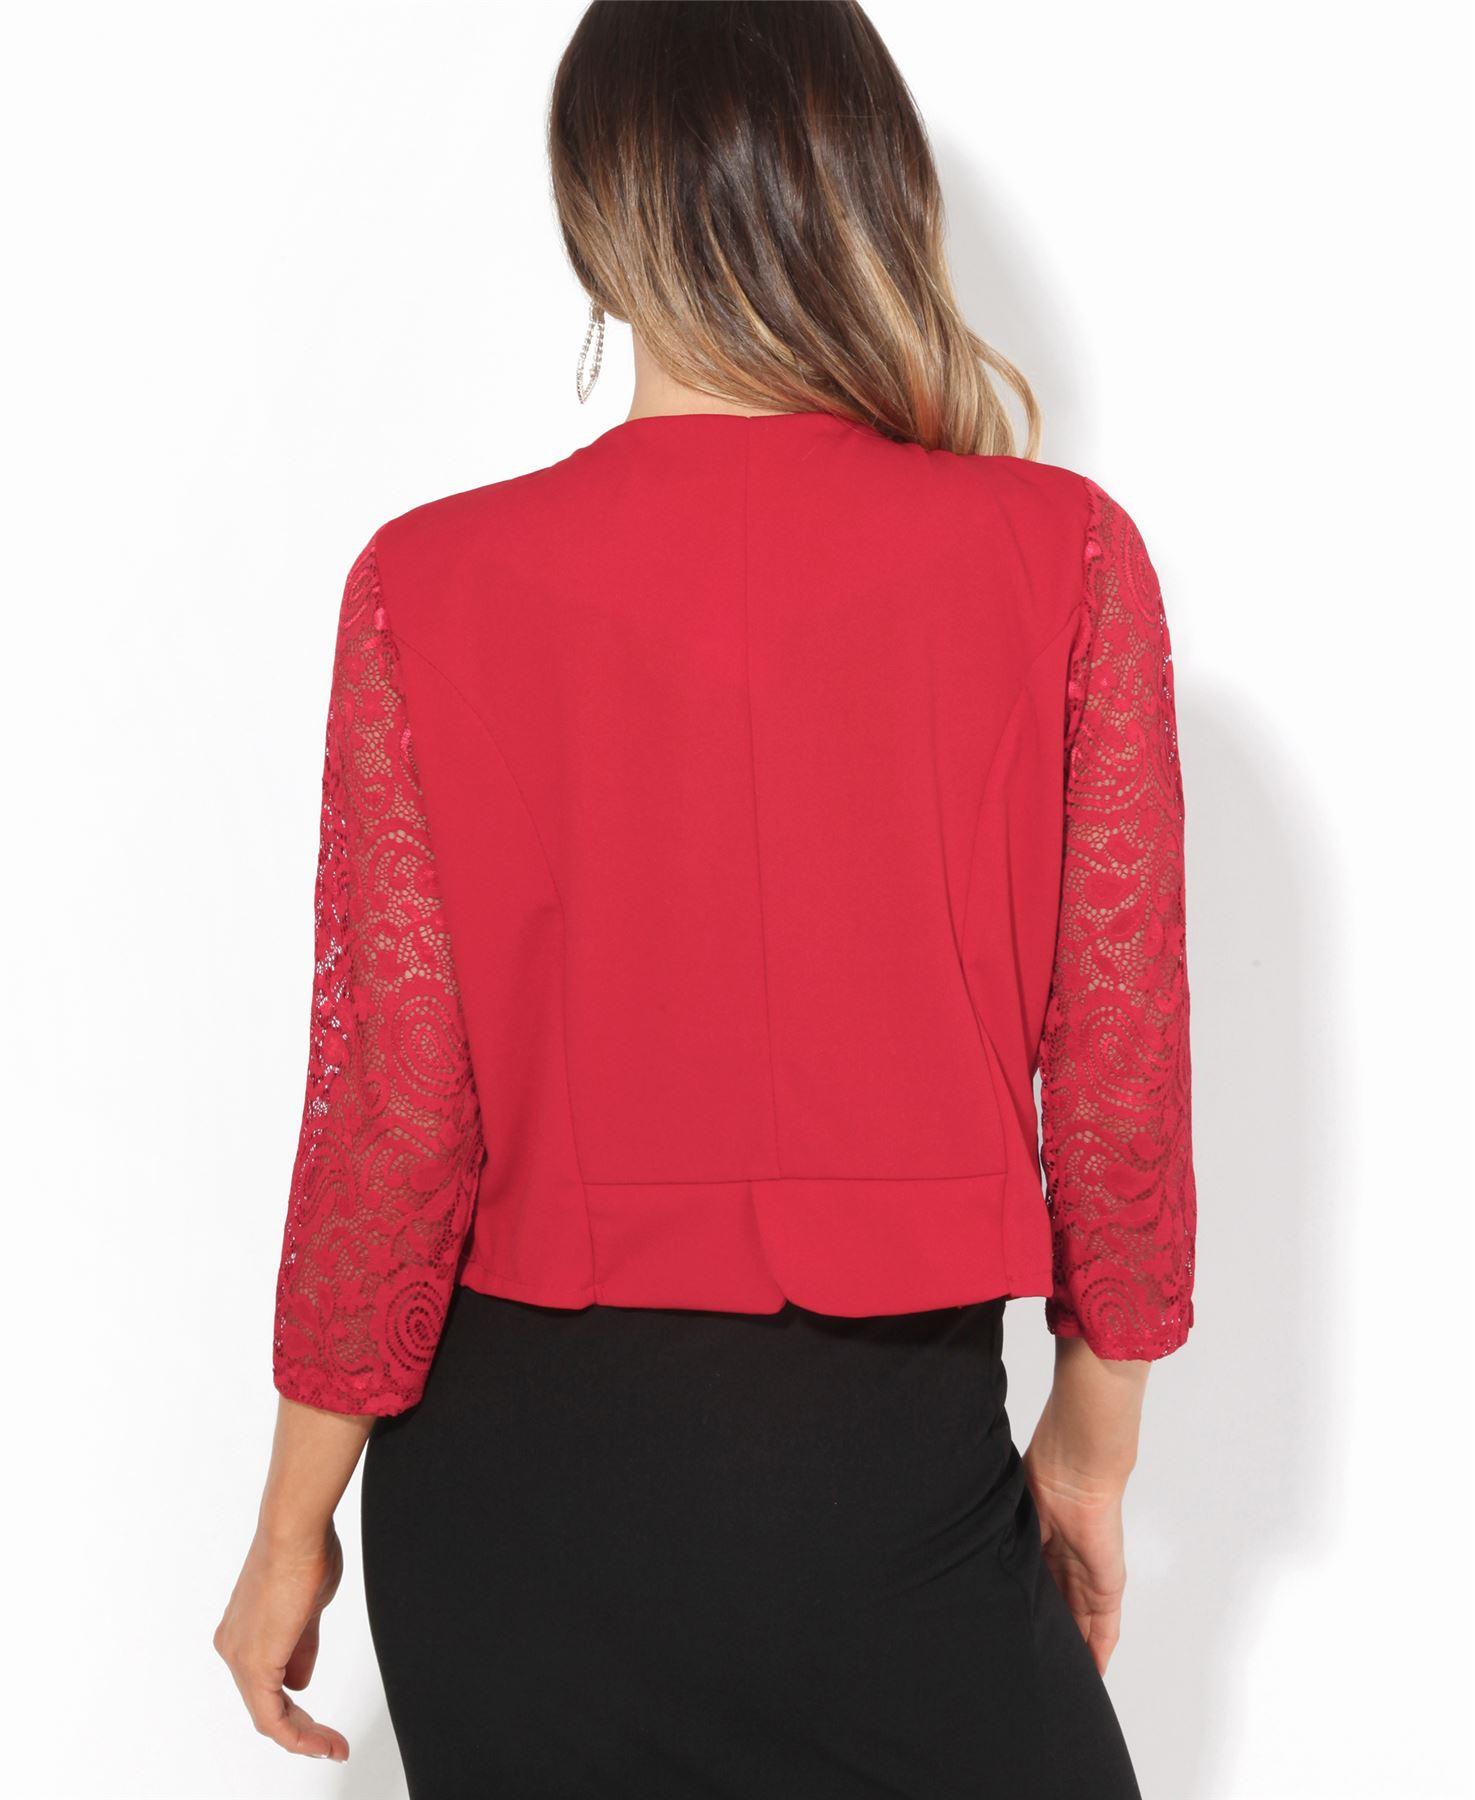 e2fed90eaf25ed Womens Ladies Lace Bolero Shrug Short Sleeve Cropped Top Cardigan ...